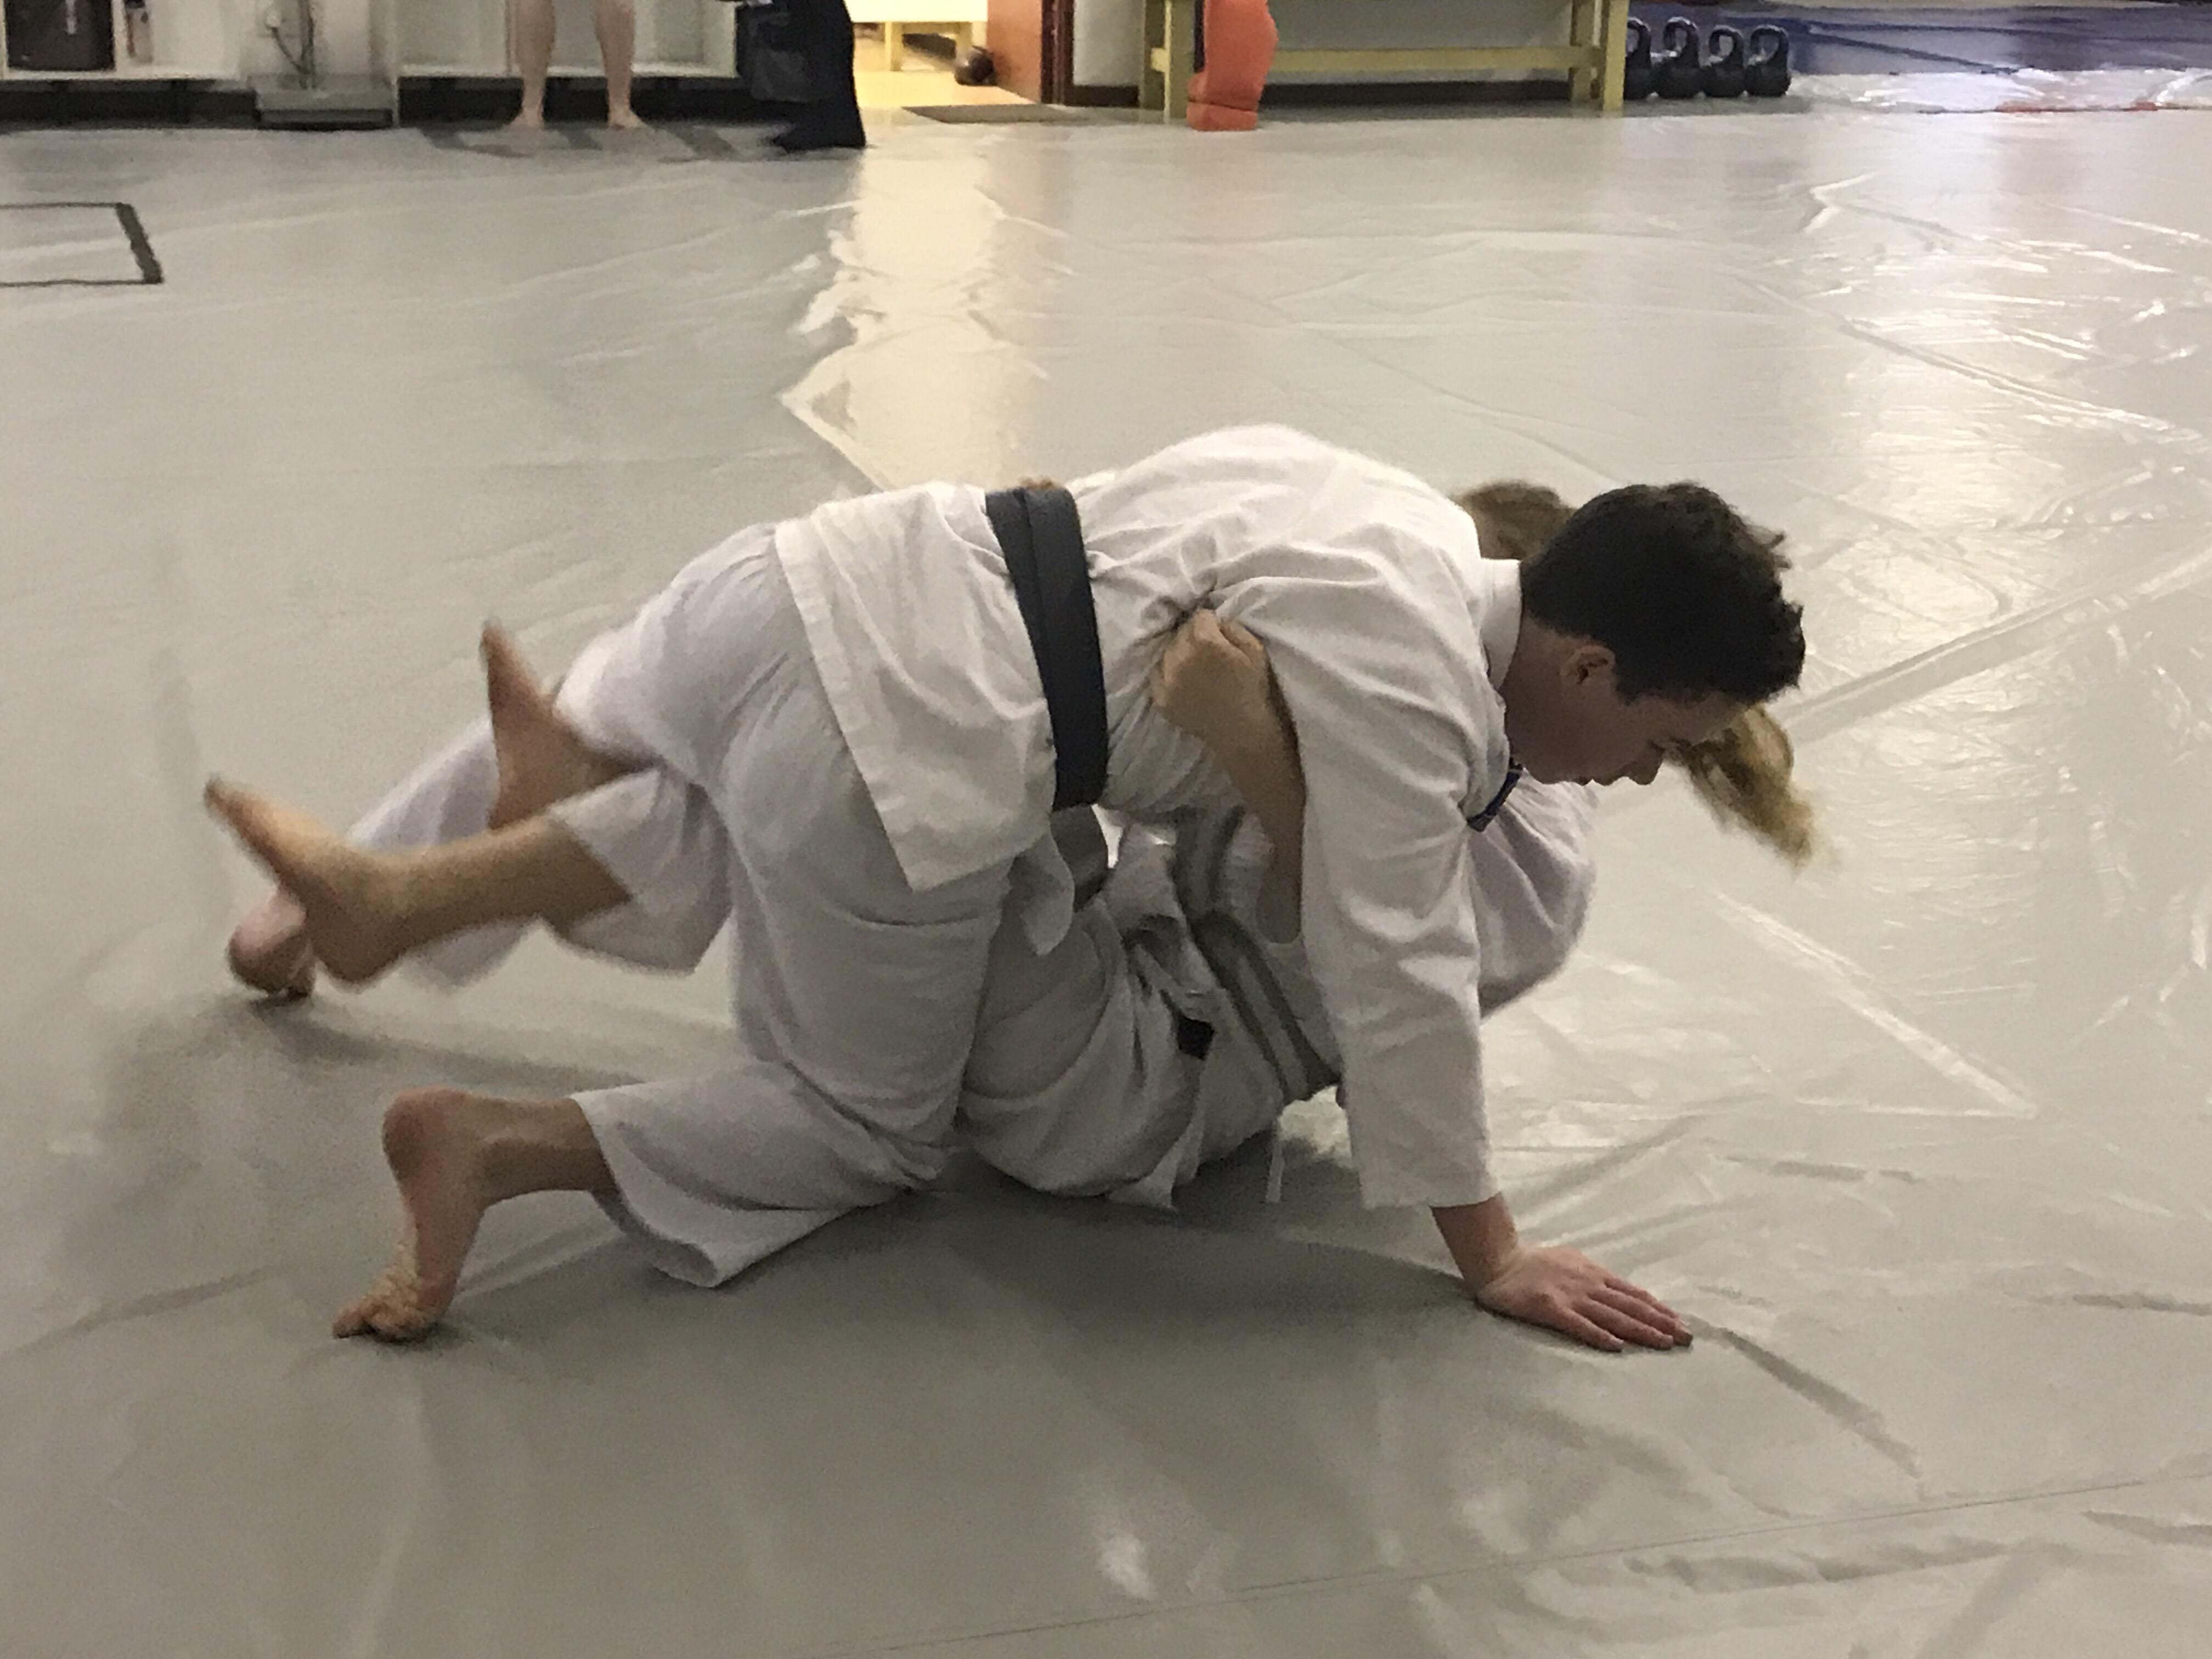 Traditional Japanese Jiu-Jitsu vs Brazilian Jiu-Jitsu: What's the difference?